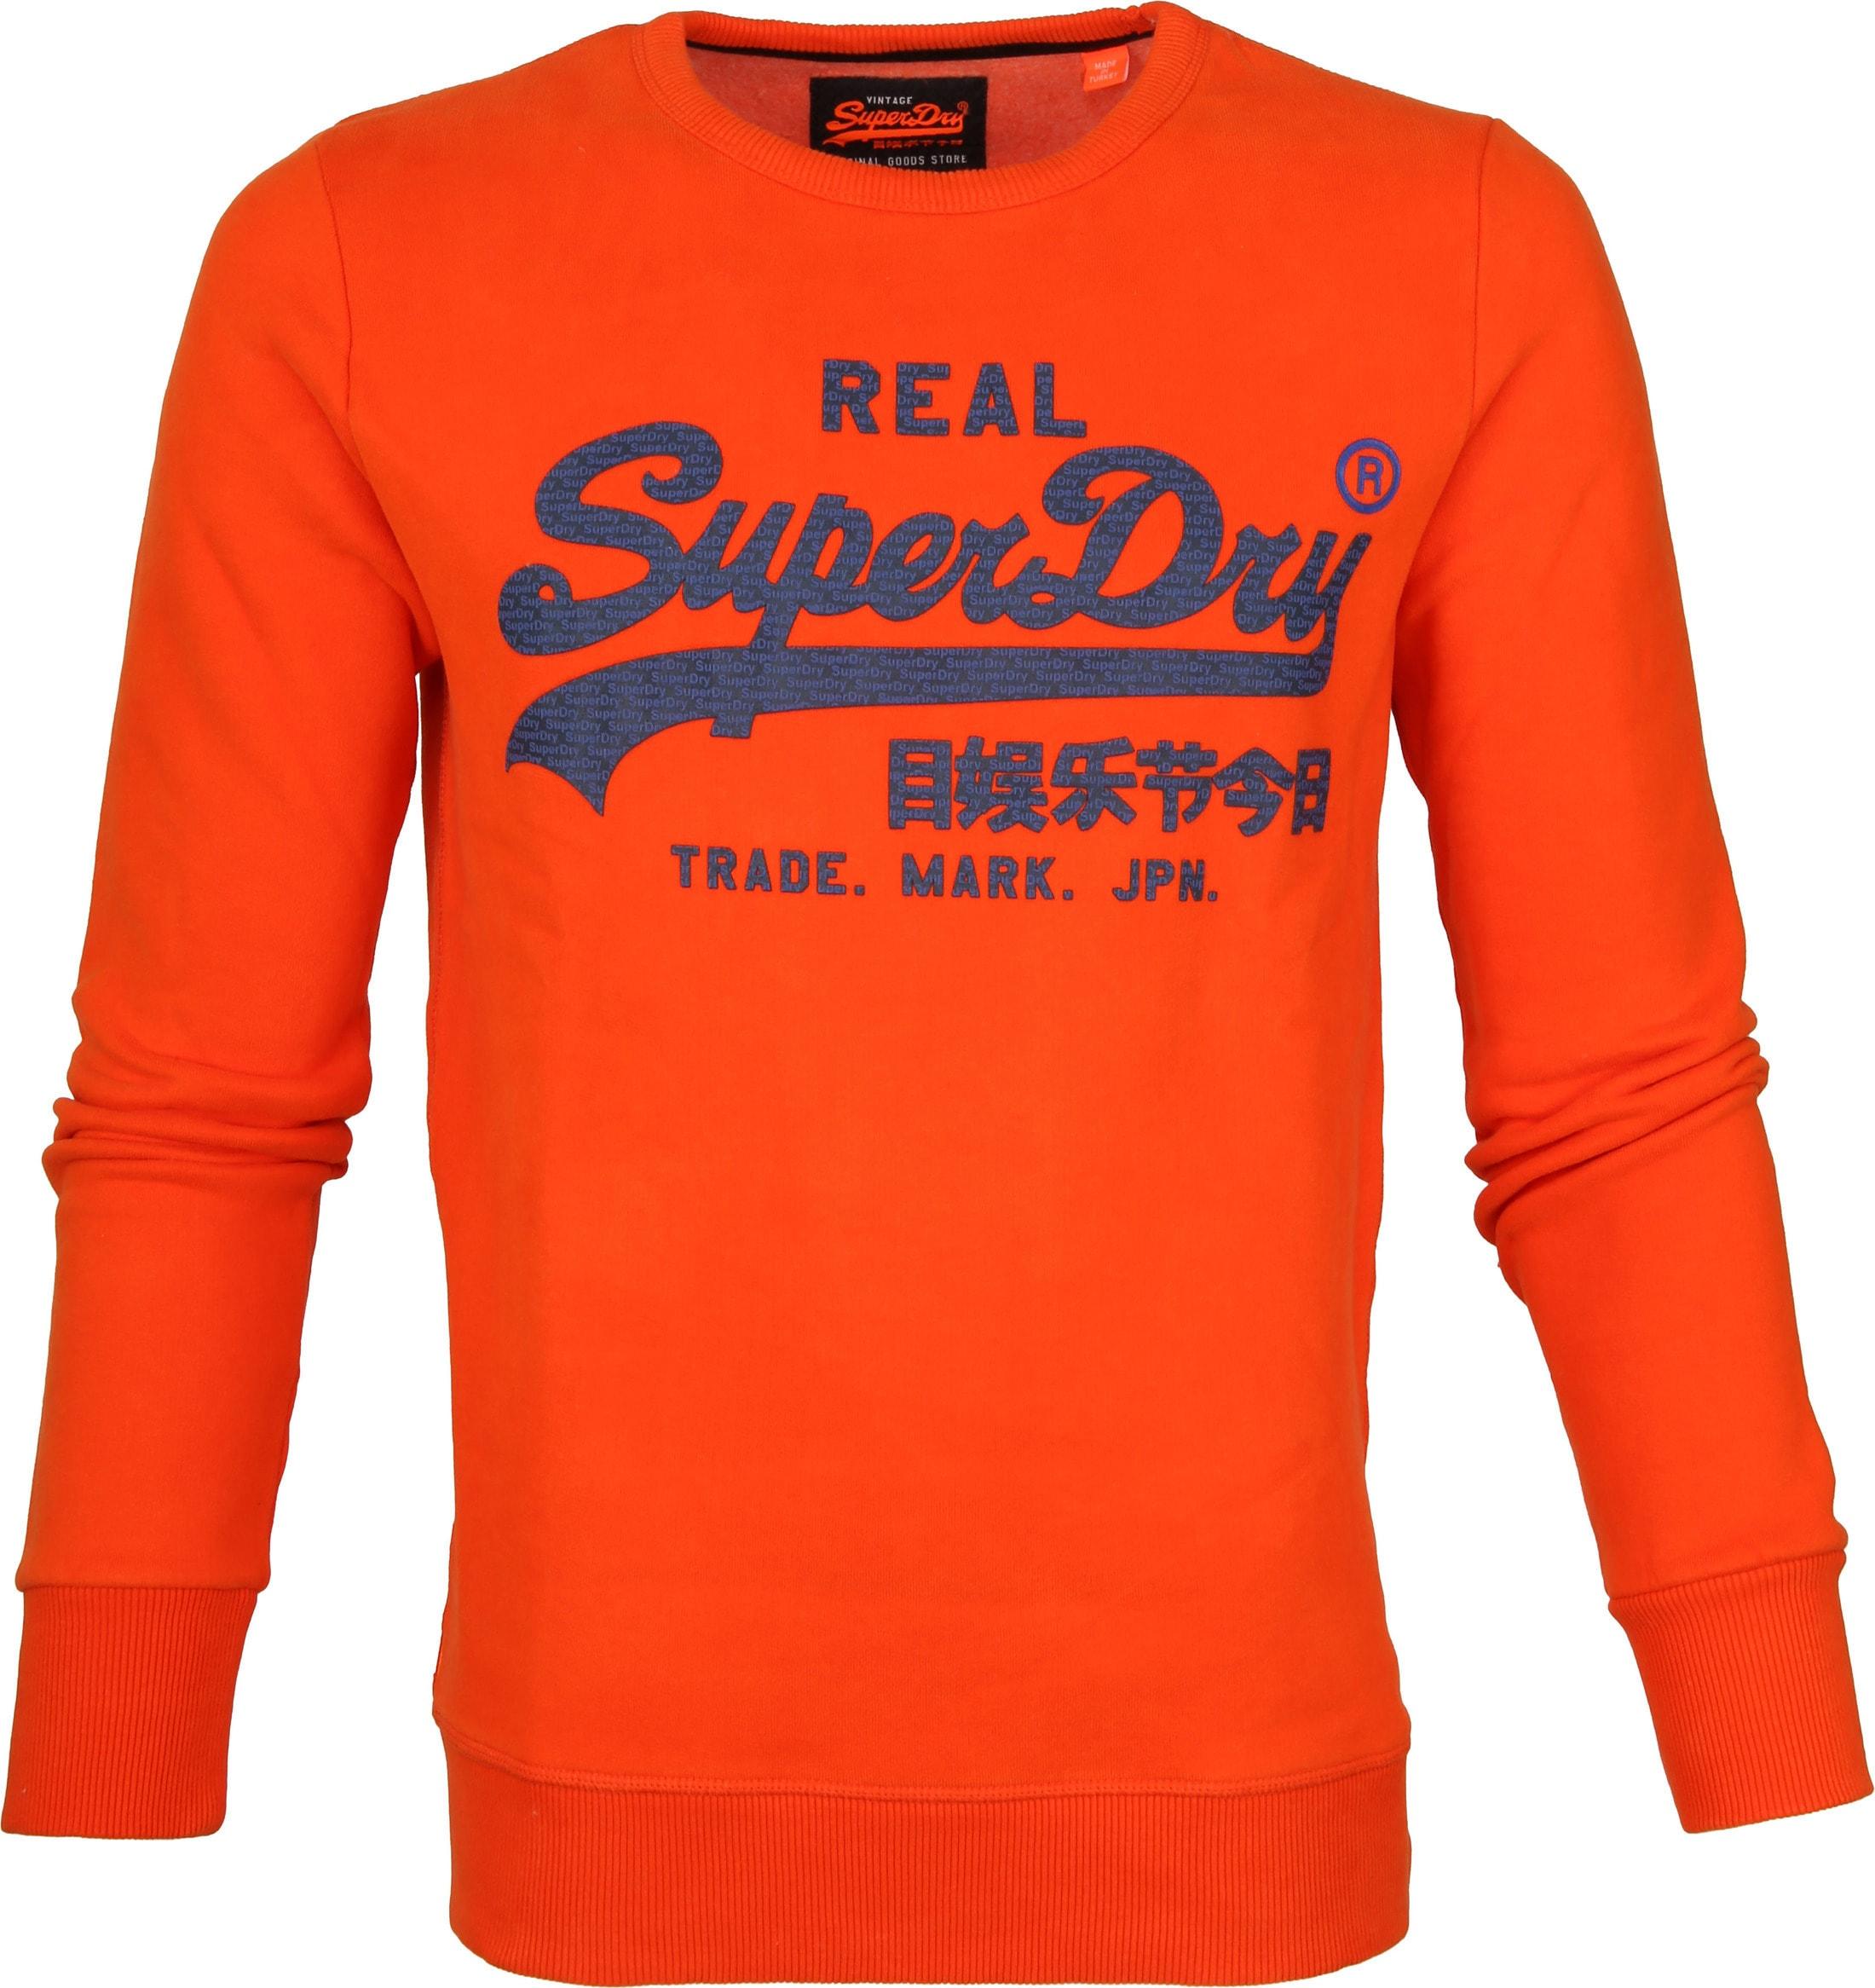 Superdry Sweater Vintage Oranje foto 0